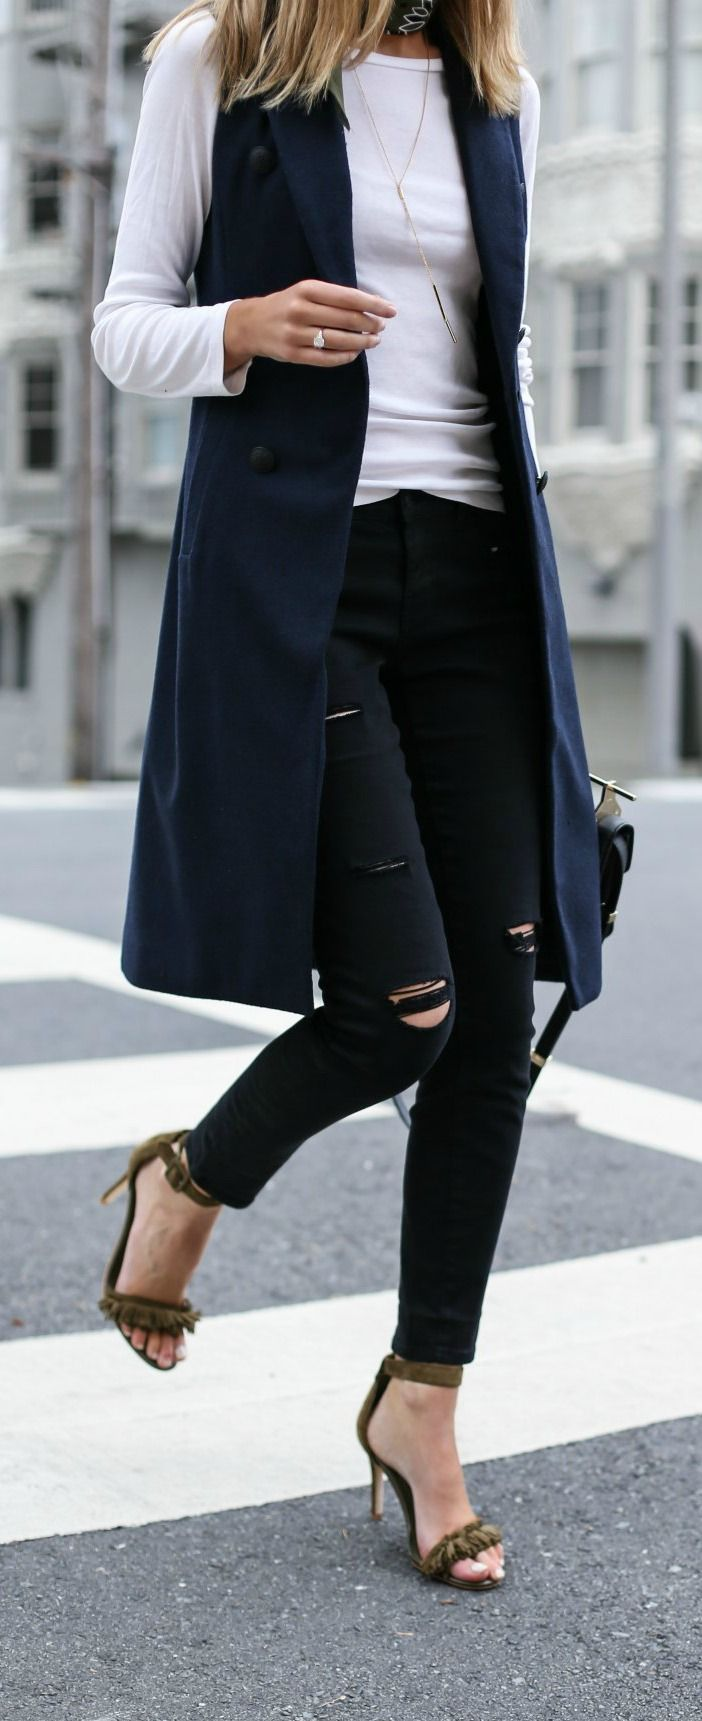 navy double-breasted vest, black distressed high waisted skinny jeans, white long sleeve tee, olive fringe heeled sandals, black handbag, olive bandana neck scarf + sunglasses {rag & bone, bp., caslon, joie, m2malletier}